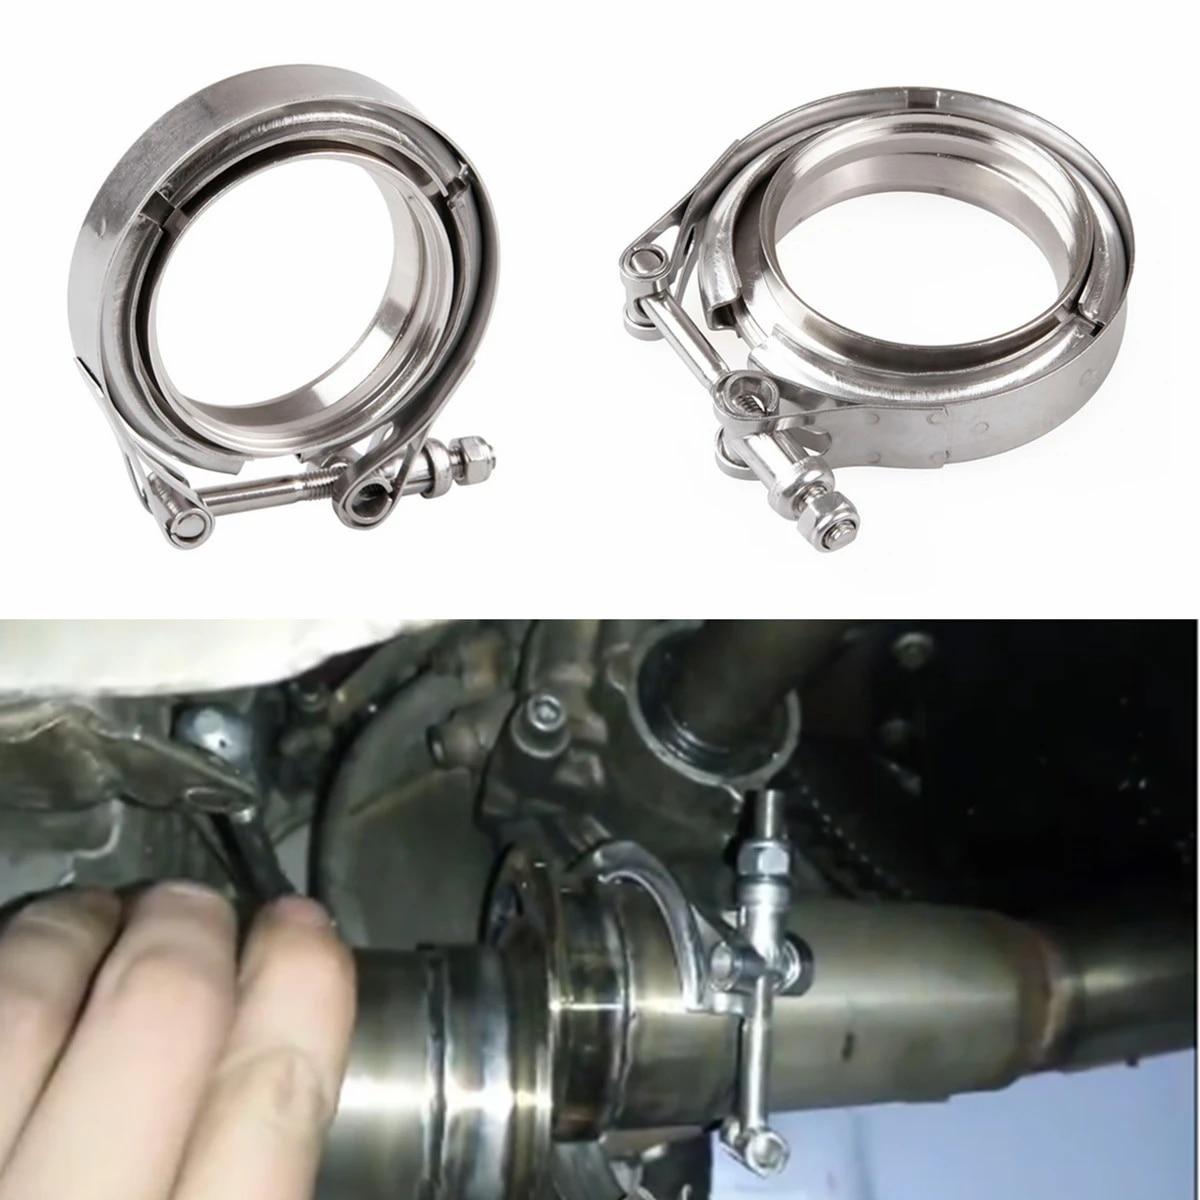 2 2 5 3 3 5 4 car aluminum flange v band exhaust clamp v band 1 5 2 2 5 3 3 5 4inch aluminium vband clamps